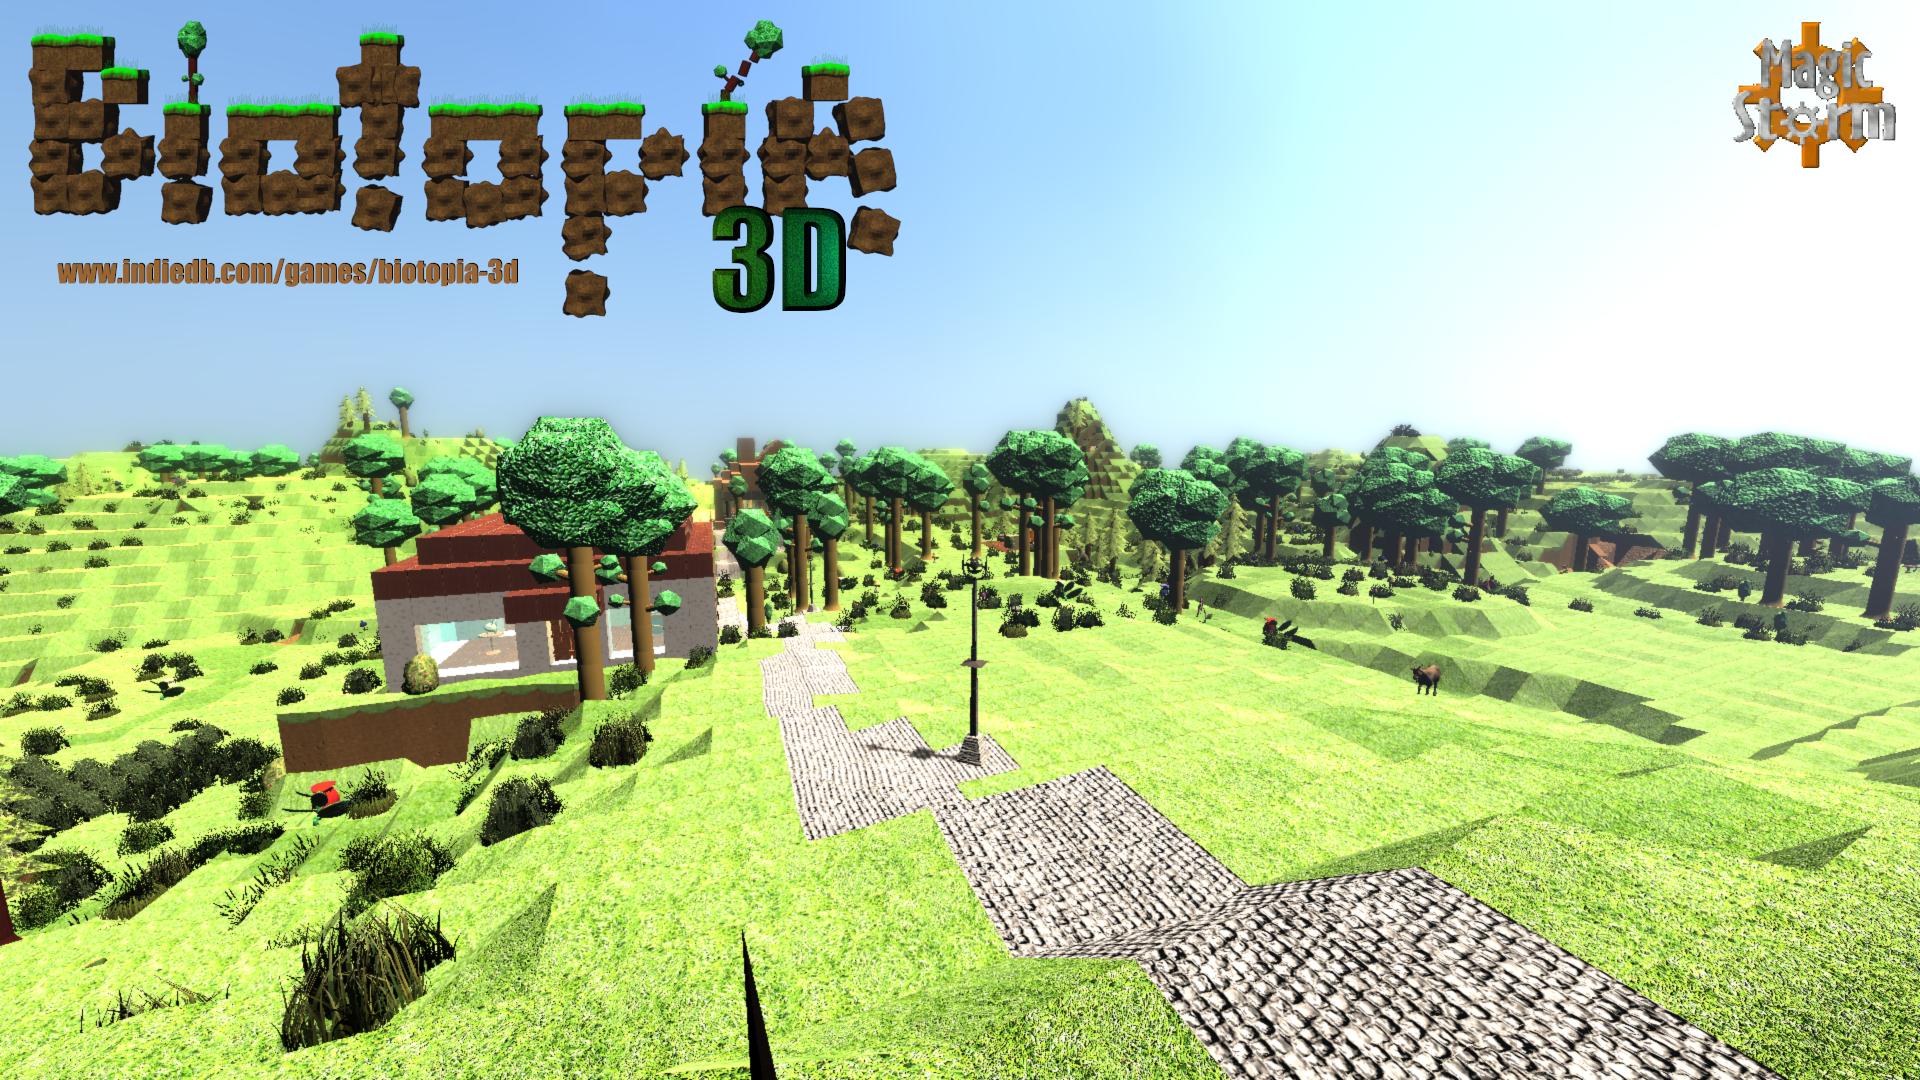 Biotopia 3D